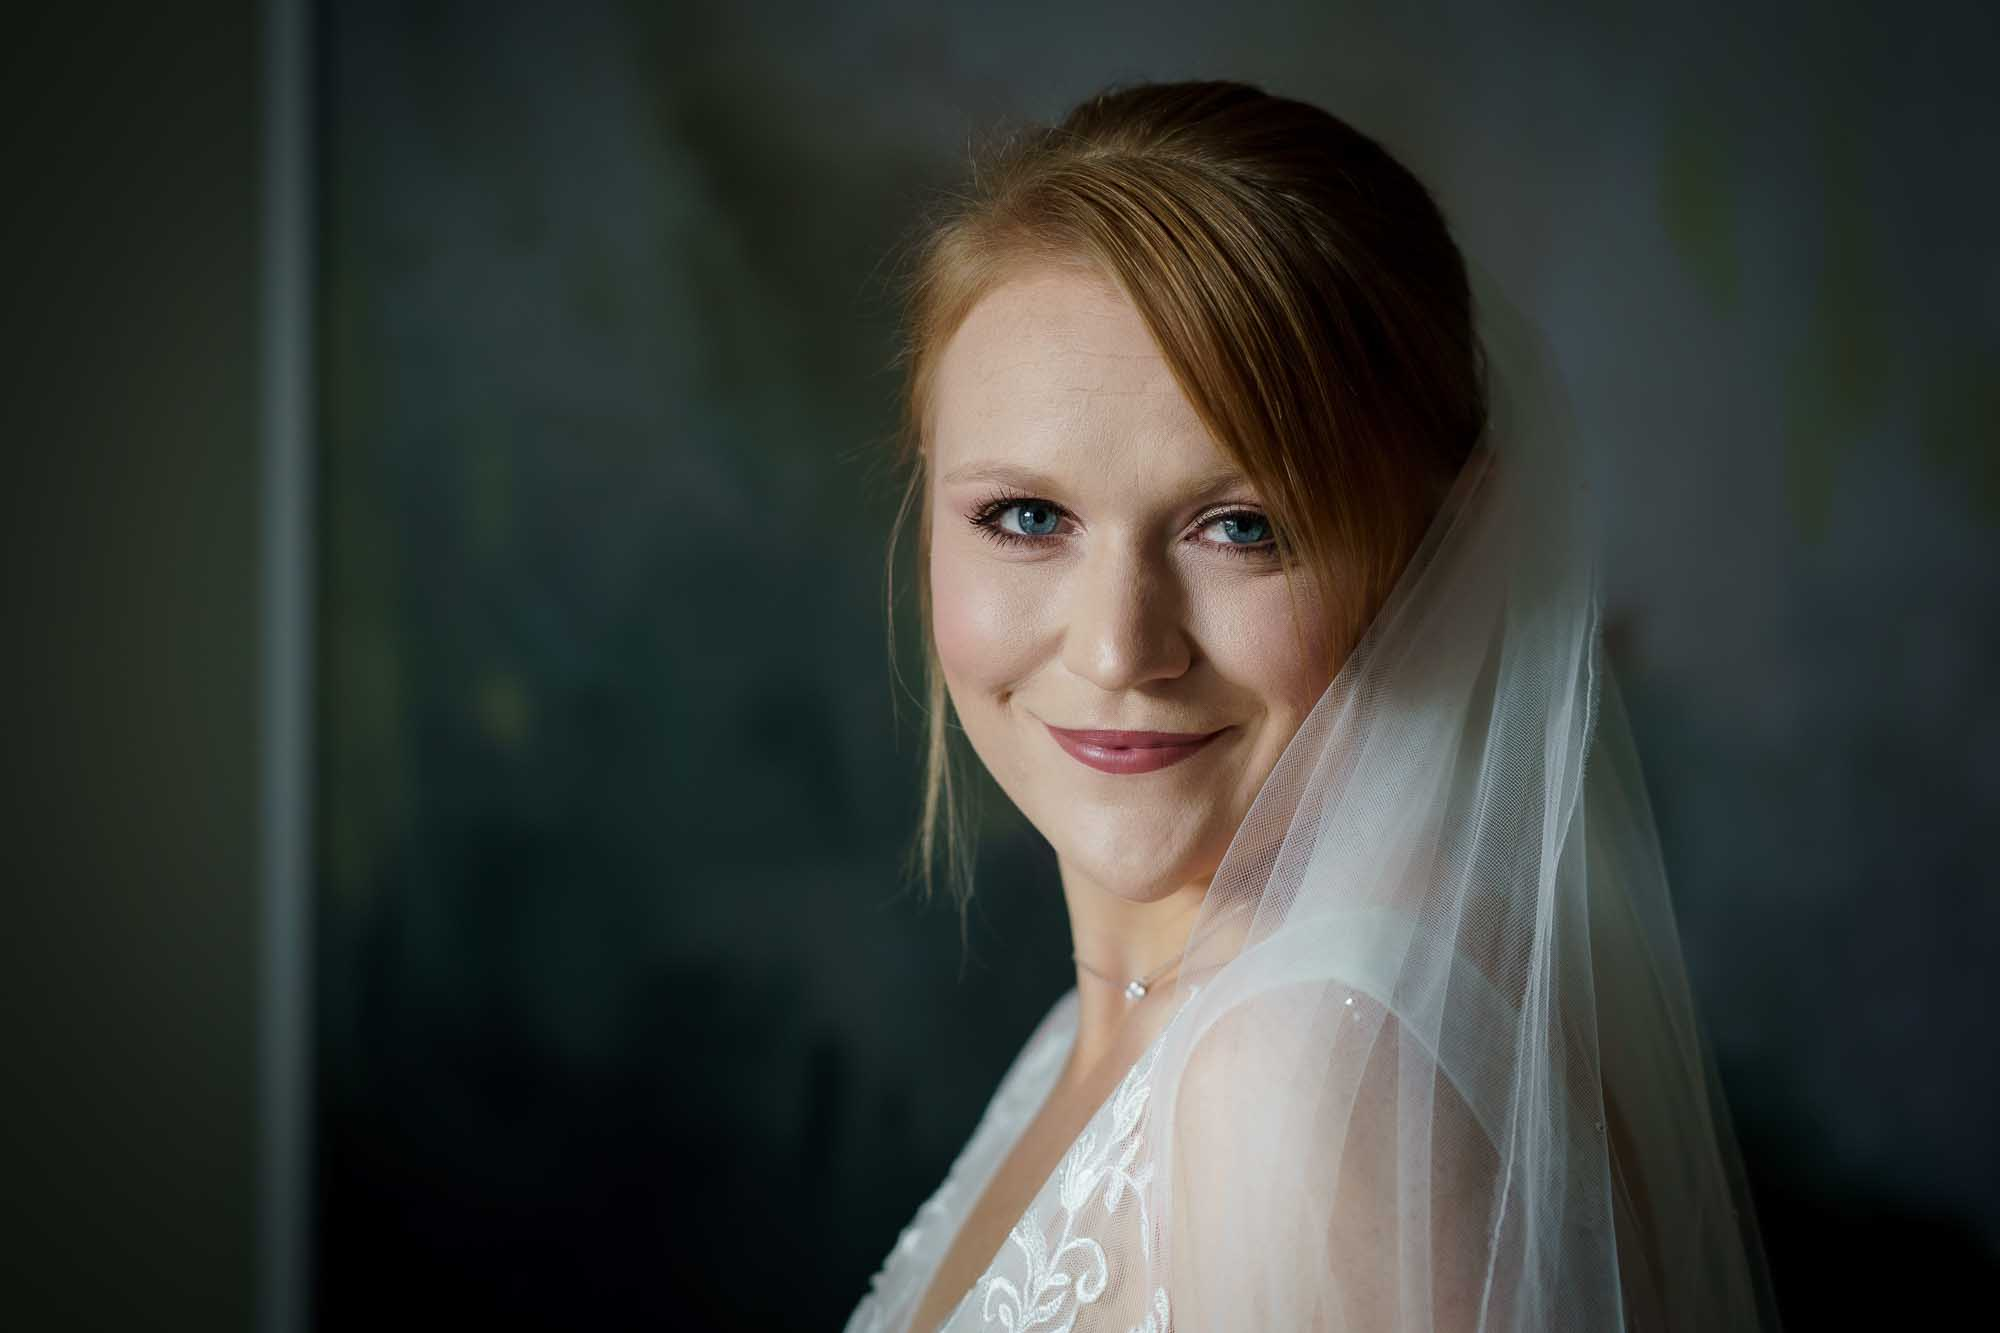 Bridal portrait at Wentbridge House Hotel in Pontefract